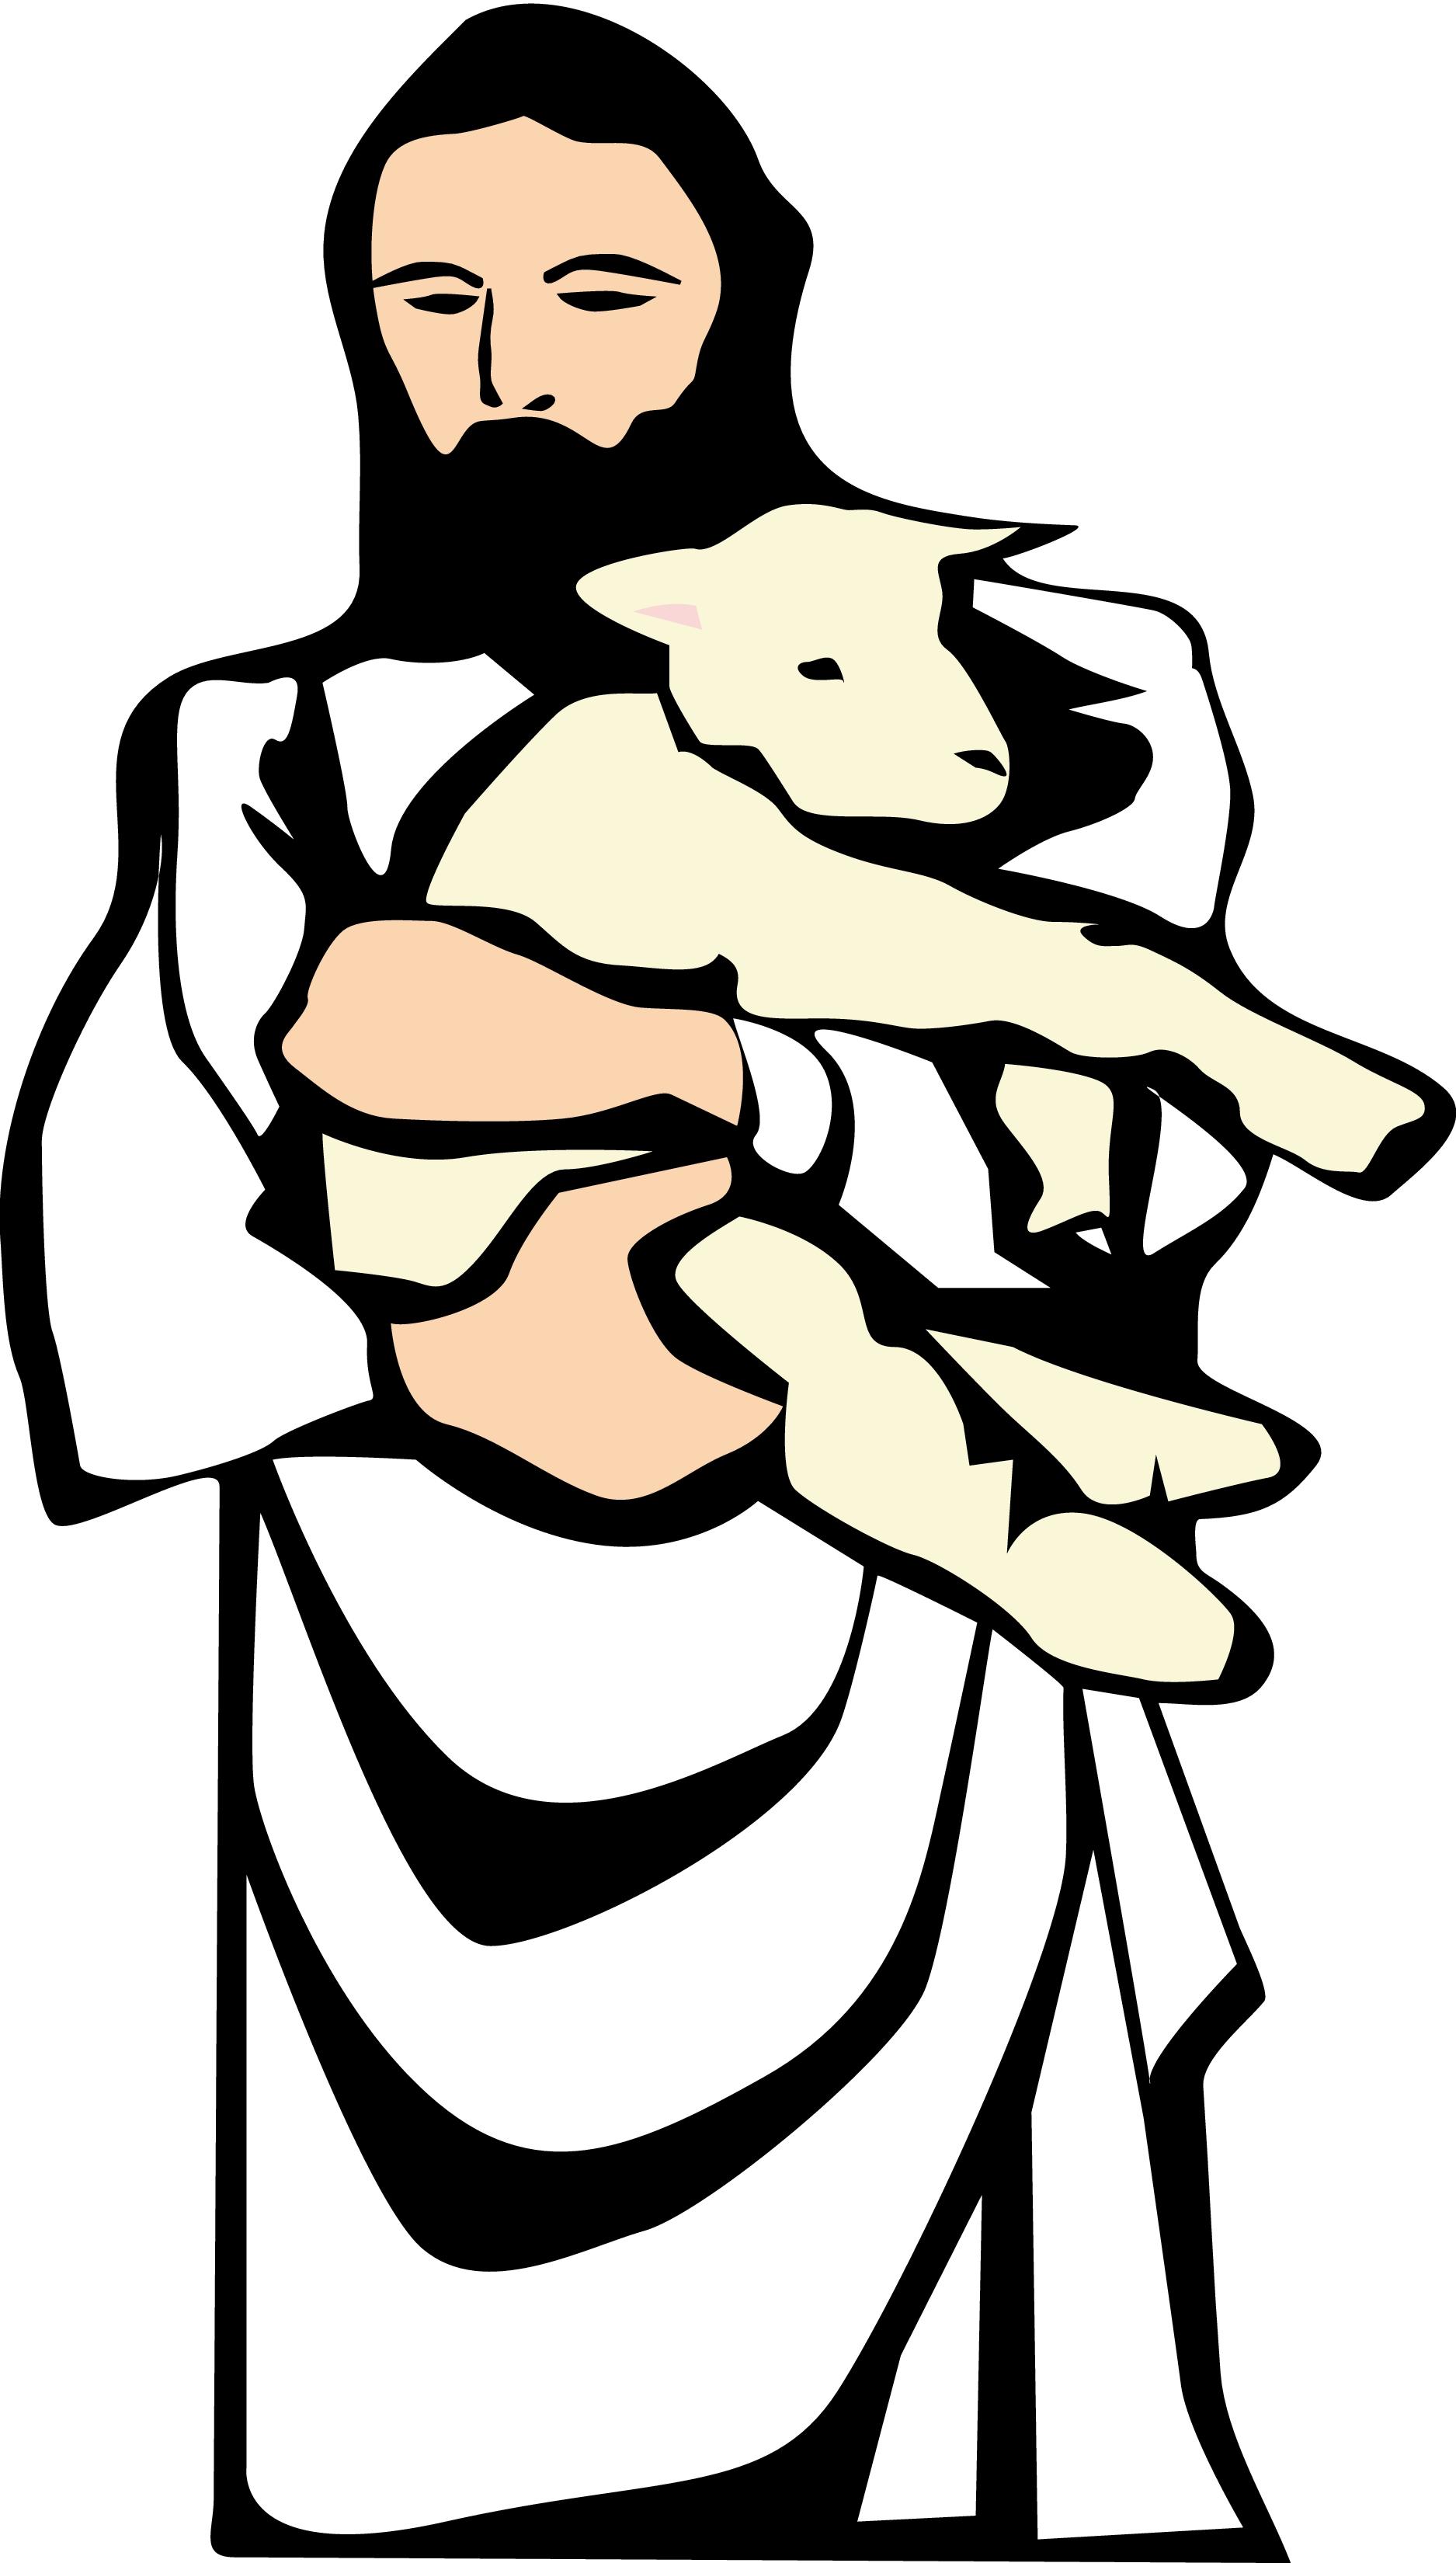 free christian clip art prodigal son - photo #5